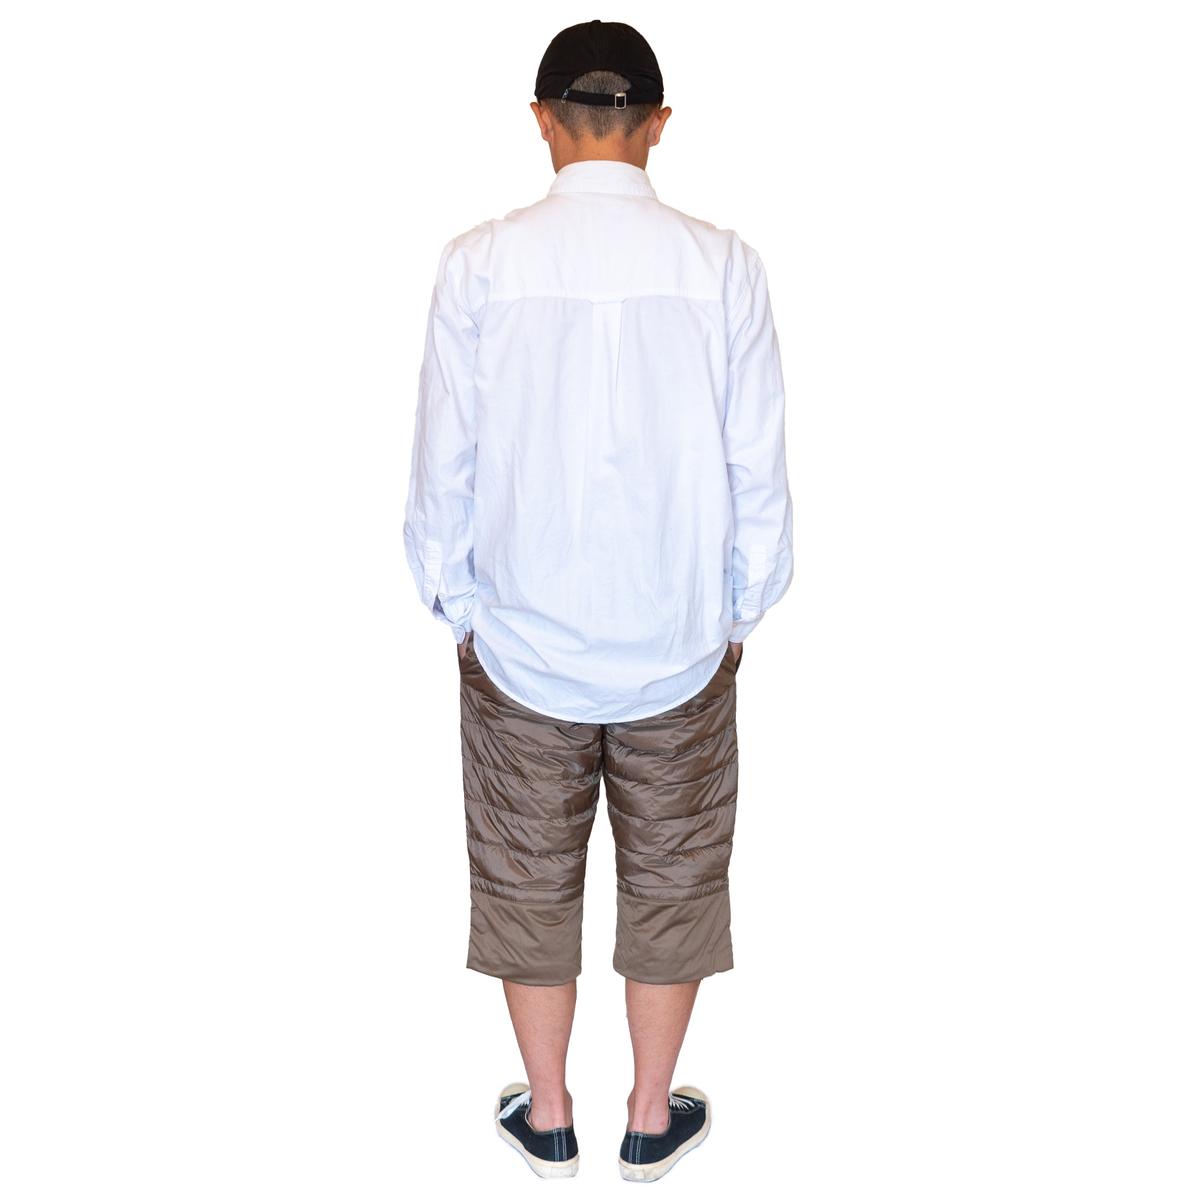 f:id:yamada0221:20210816113100j:plain